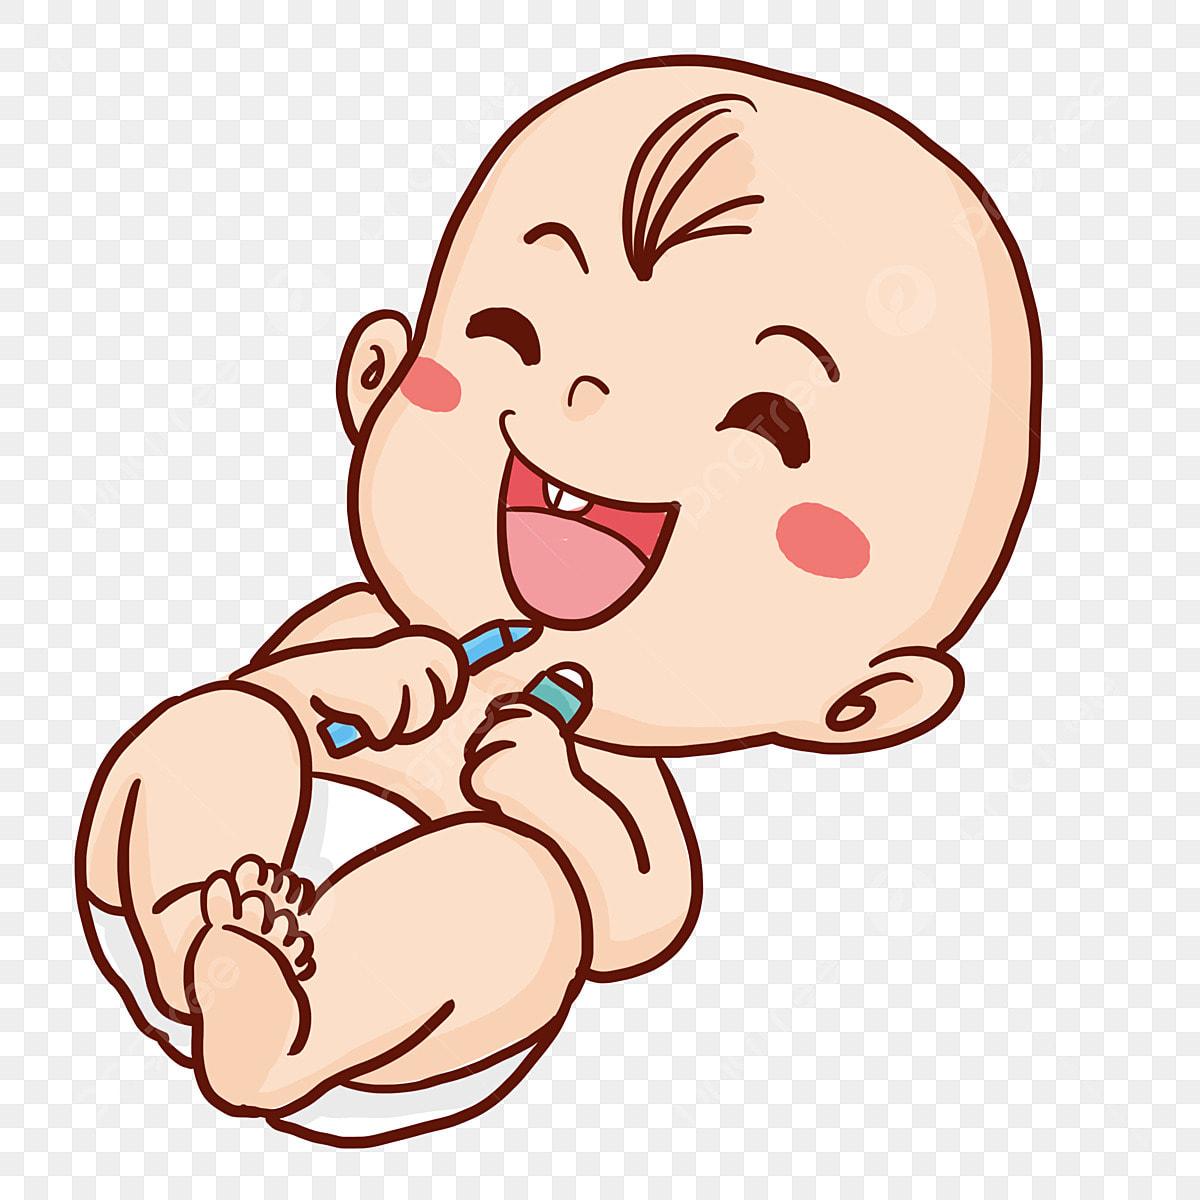 Nino Bebe Bebe Dibujo Animado Ilustracion Bebe Moderno Png Y